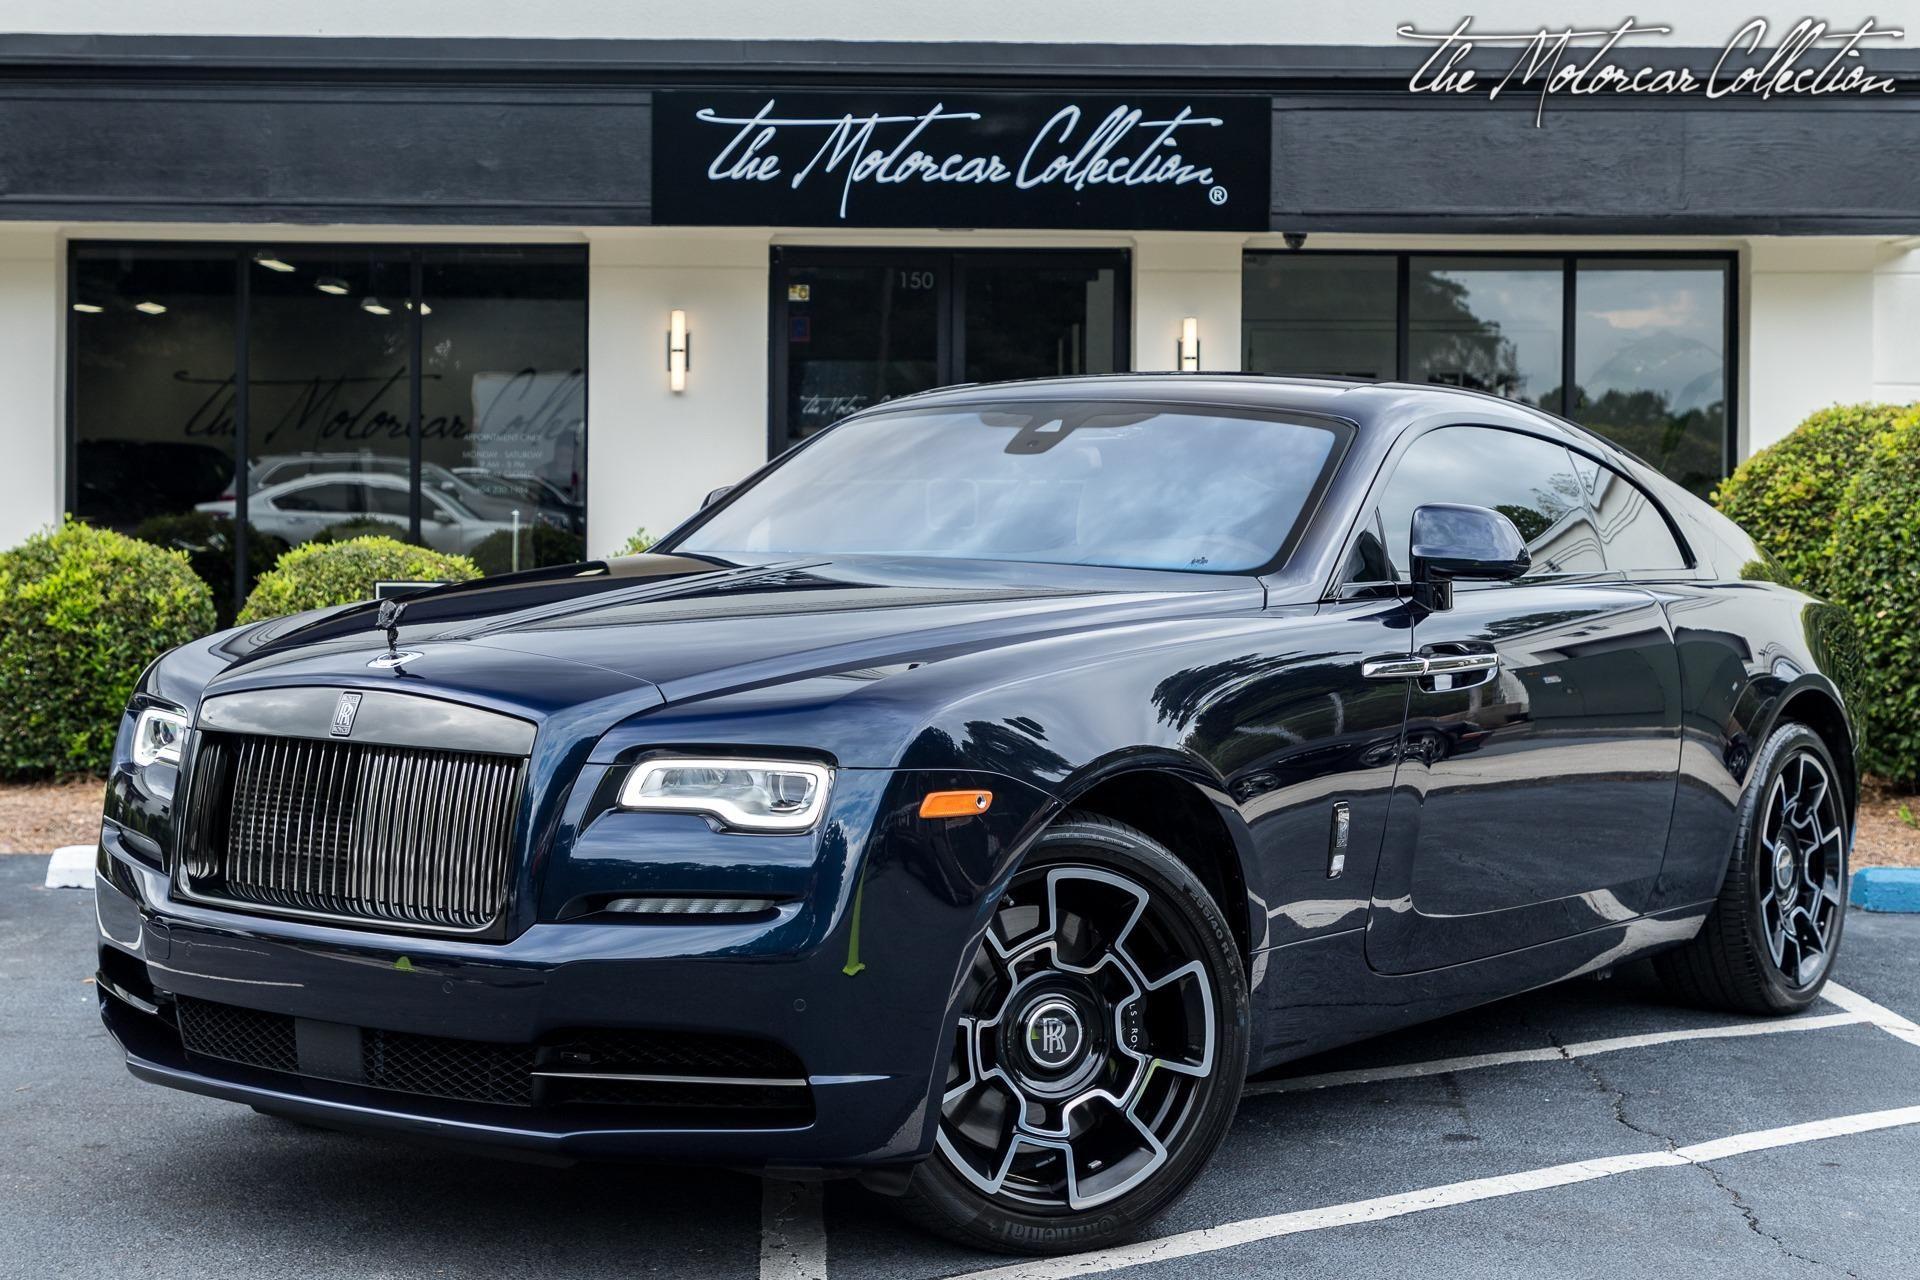 2017 Rolls Royce Wraith Black Badge Stock Mc1927 For Sale Near Atlanta Ga Ga Rolls Ro Rolls Royce Wraith Black Rolls Royce Wraith 2017 Rolls Royce Wraith